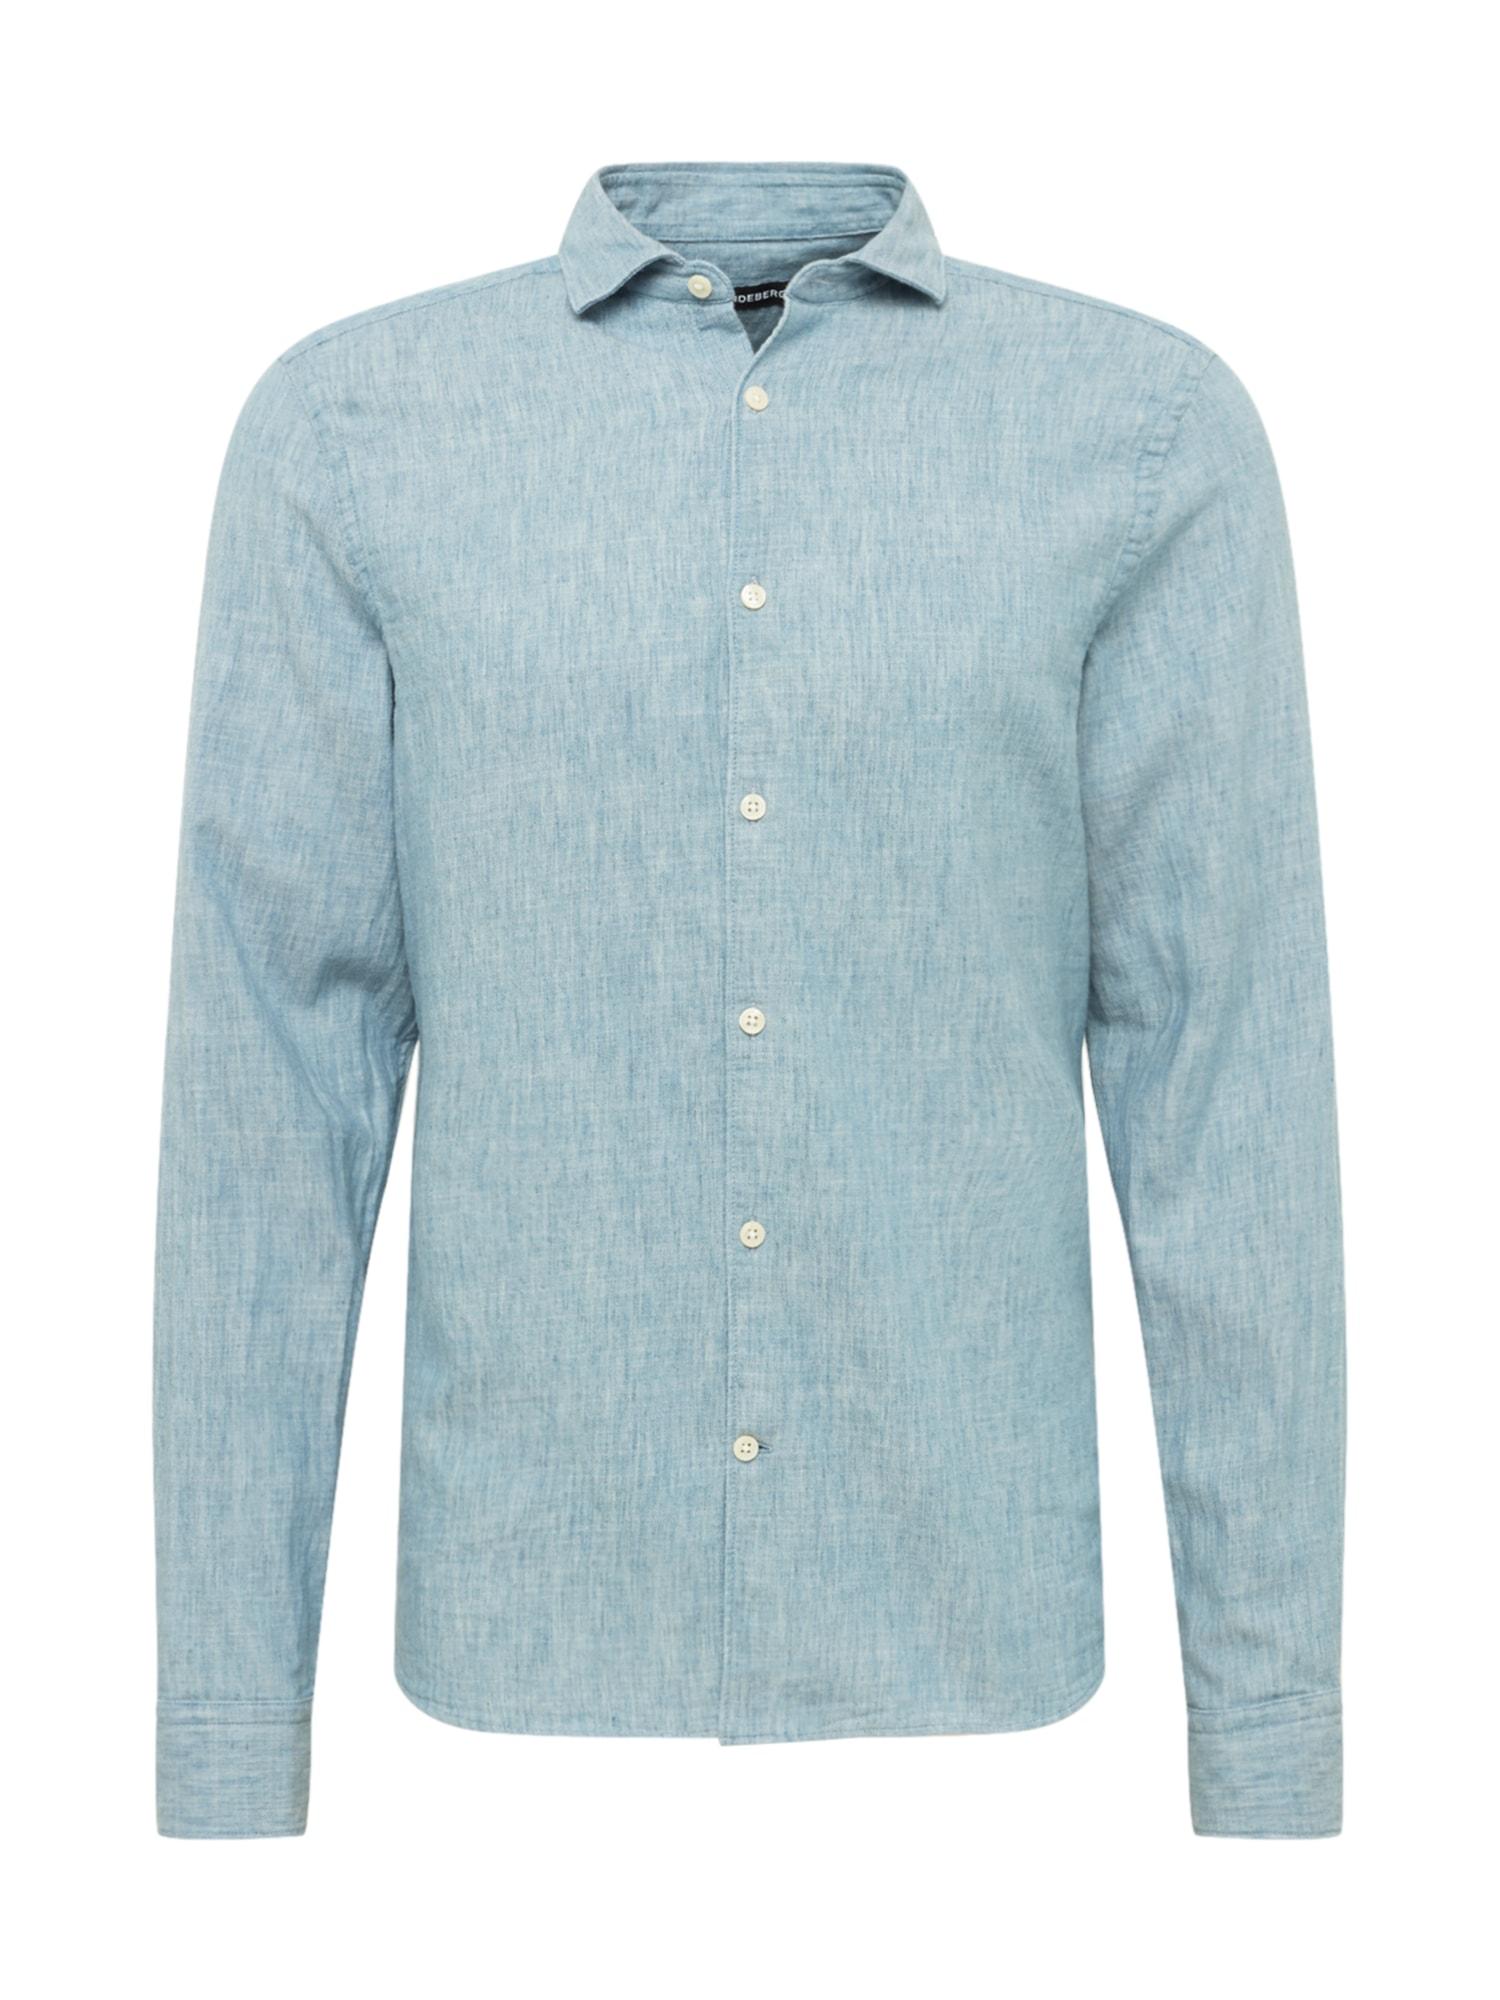 J.Lindeberg Marškiniai margai mėlyna